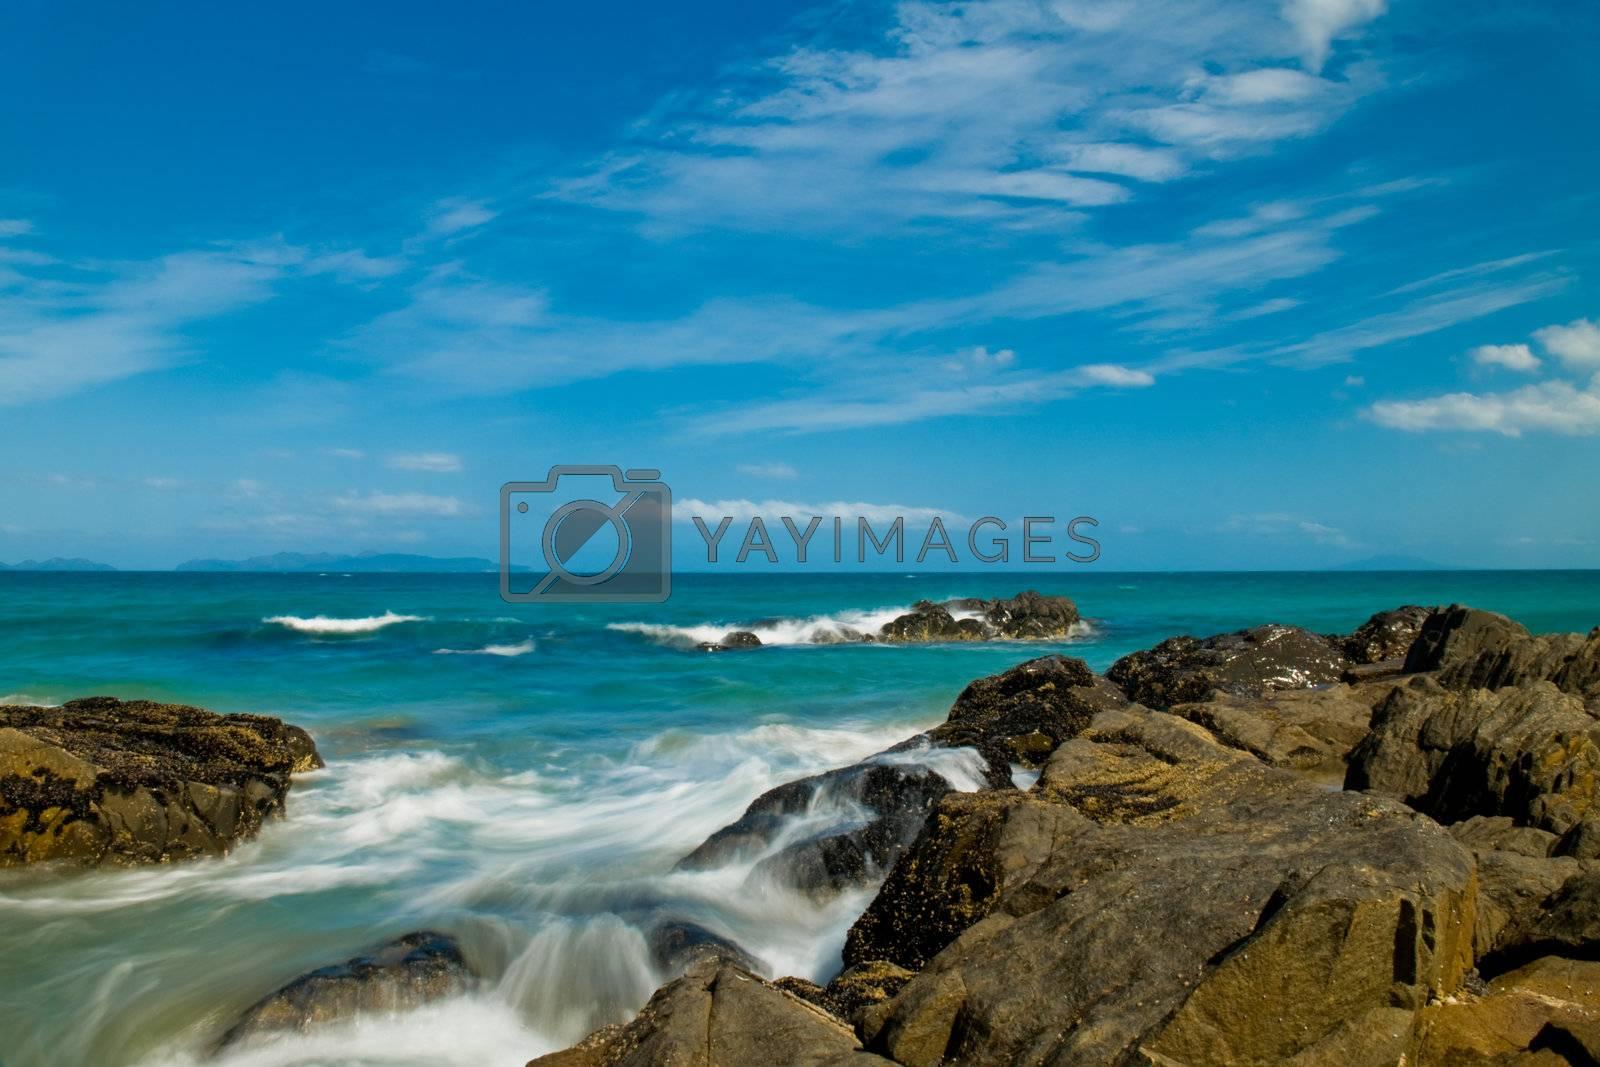 Sea landscape with rock beach coastline, blue sky, long exposure, incoming waves